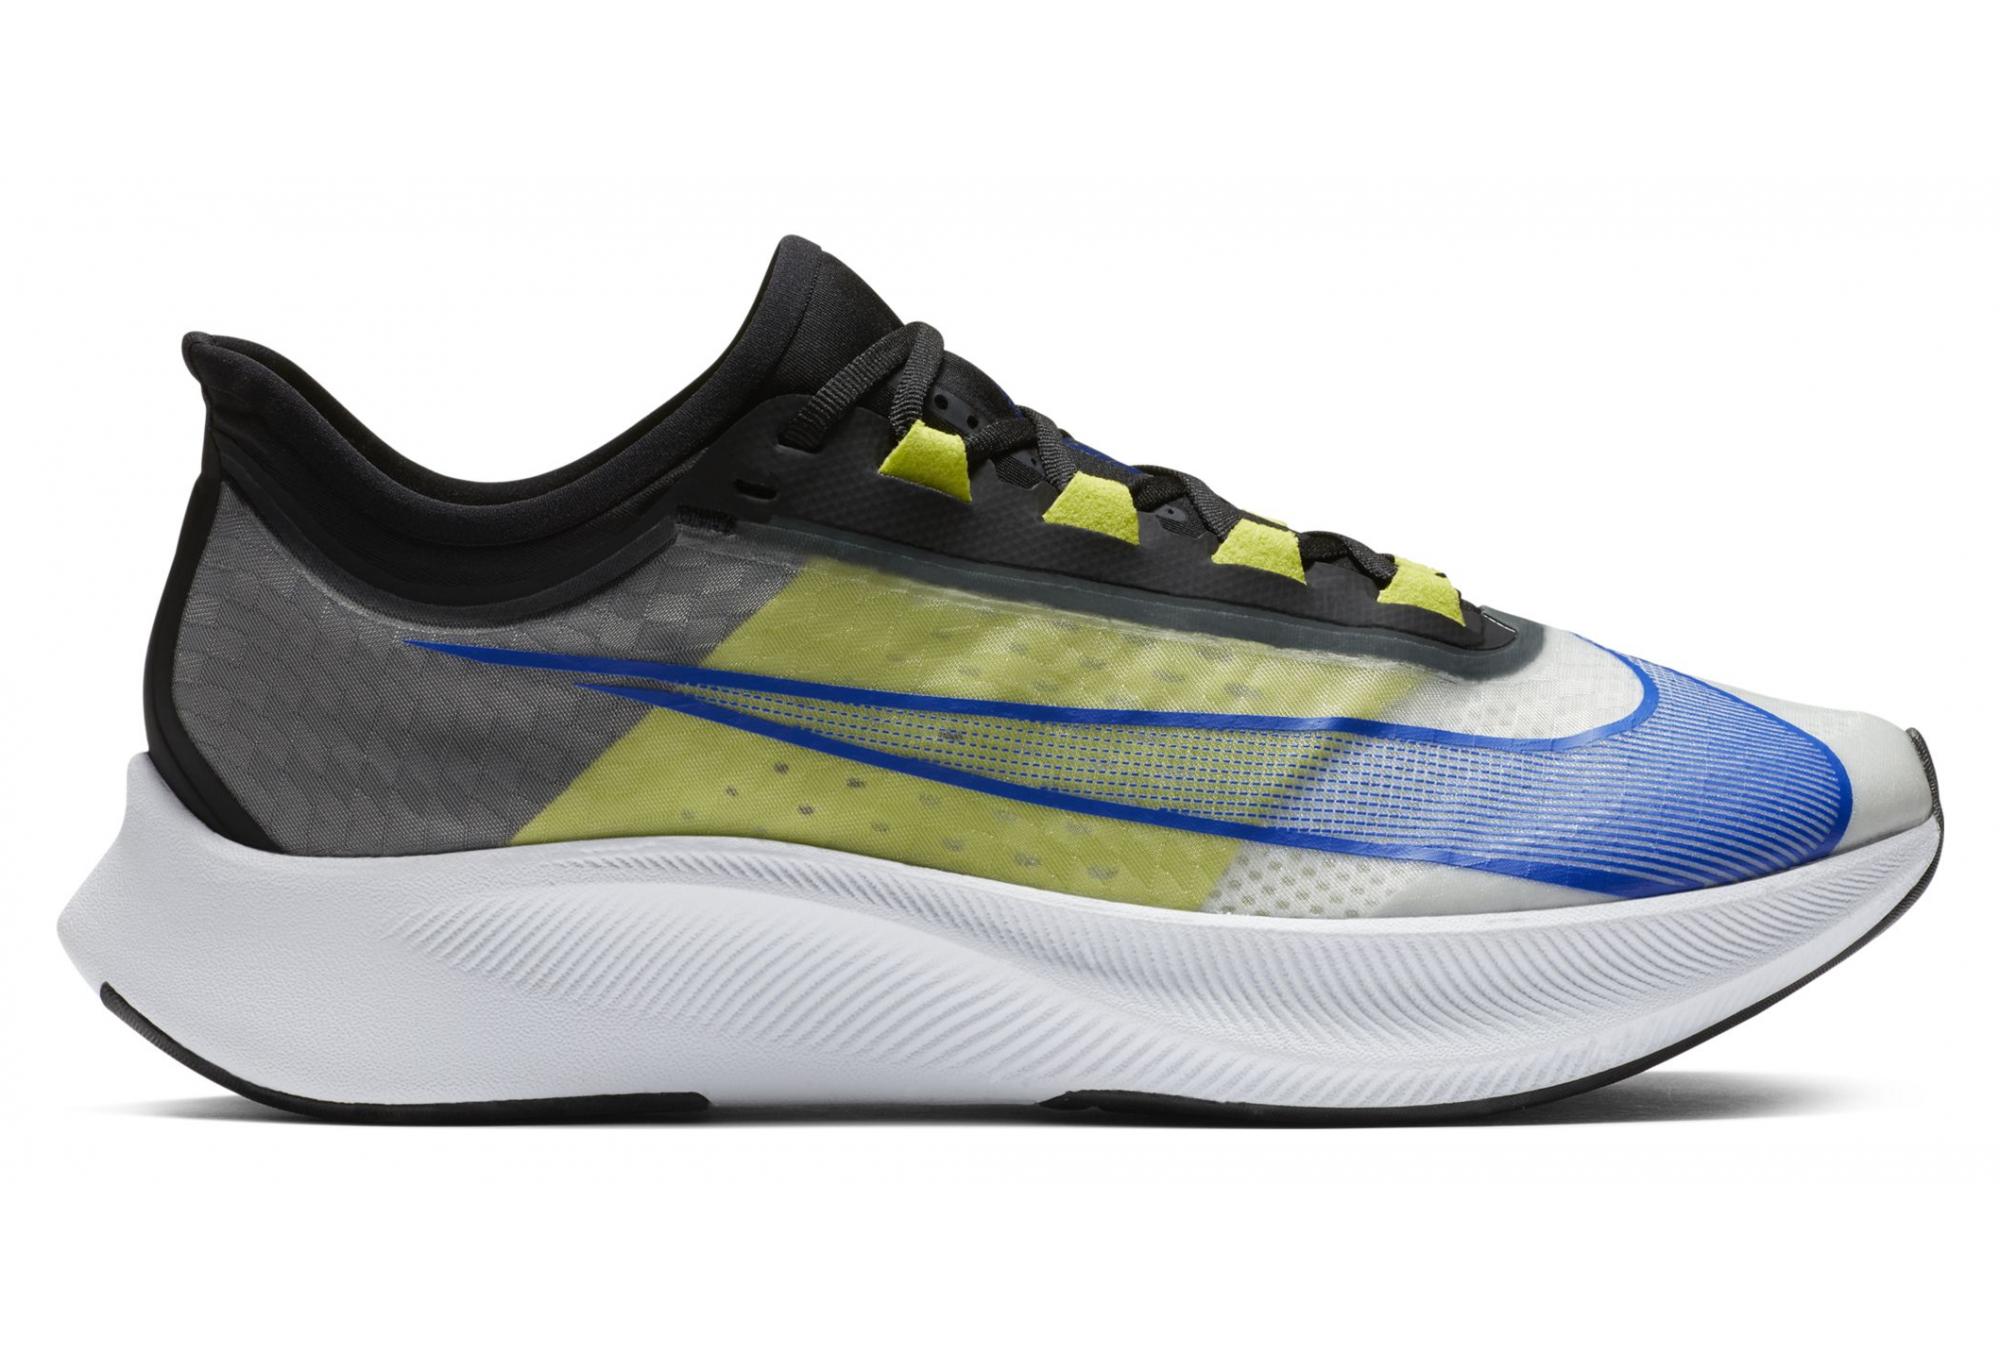 Nike Zoom Fly 3 Ekiden Running Shoes Yellow Black Blue Men ...